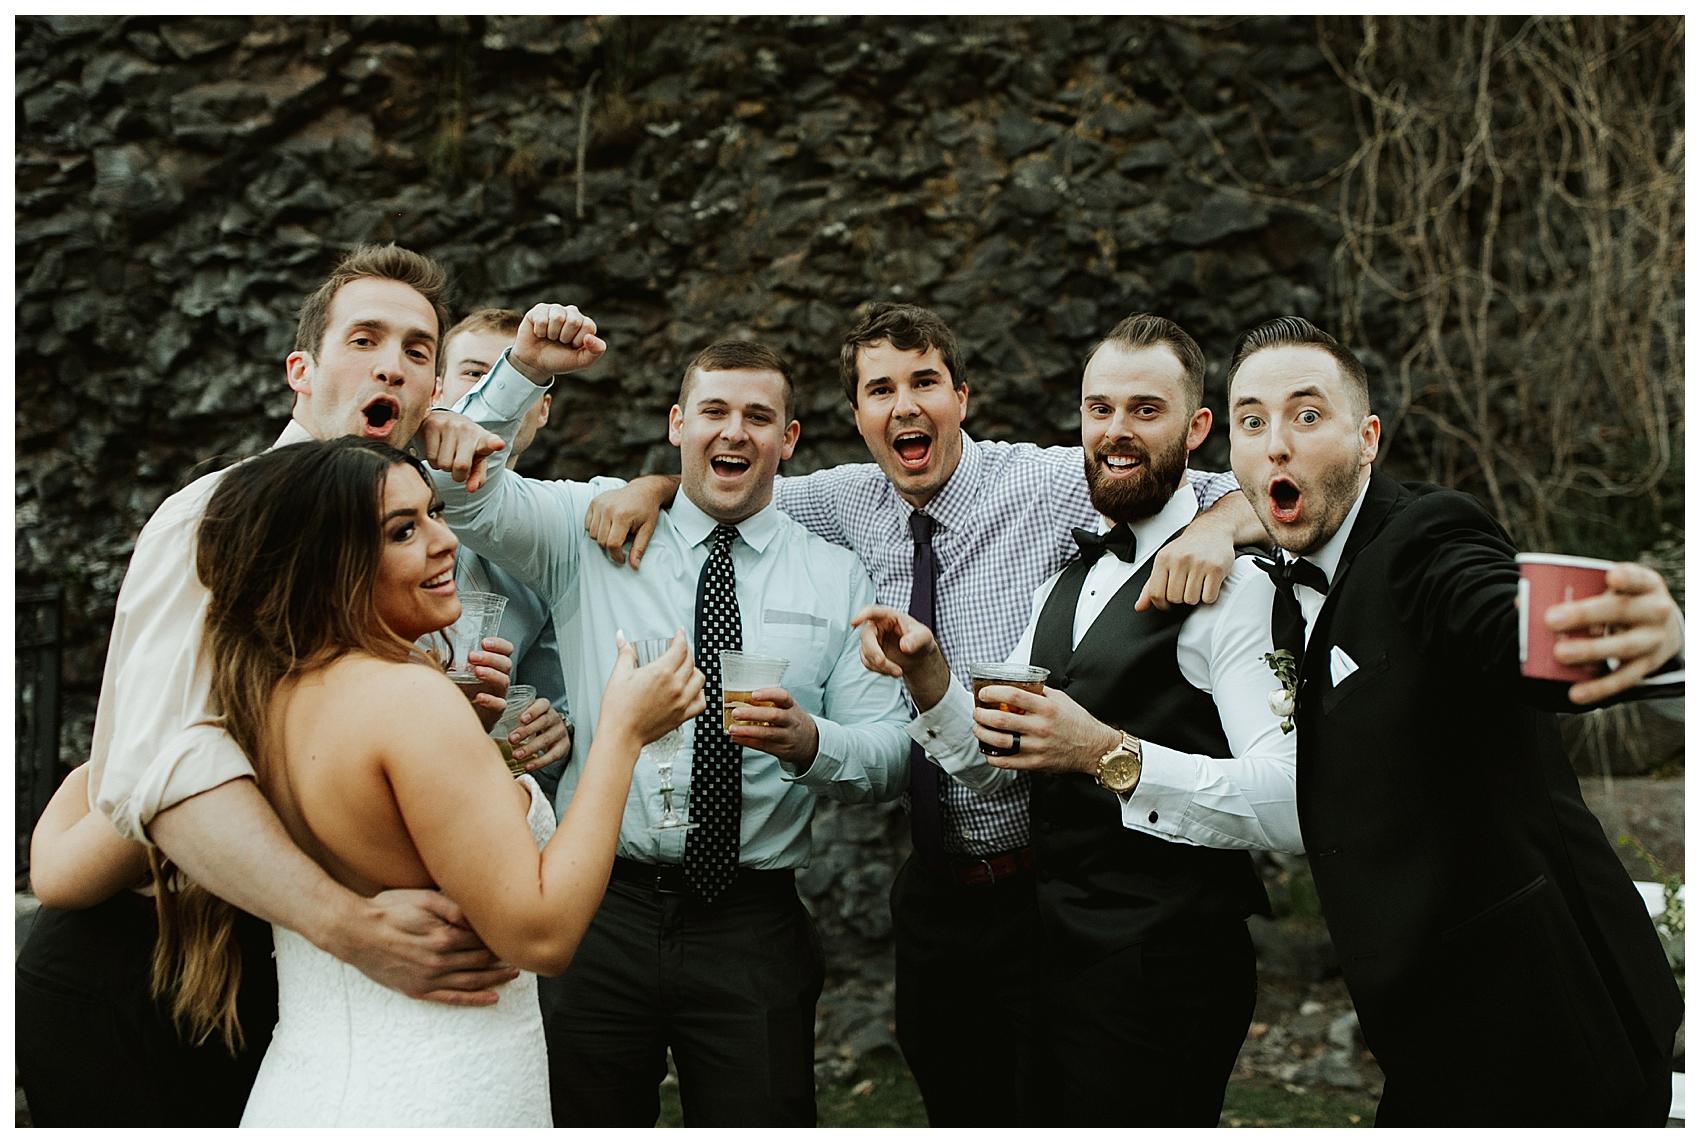 Chateau Rive Spokane Wedding Cassie Trottier Photography01124.jpg